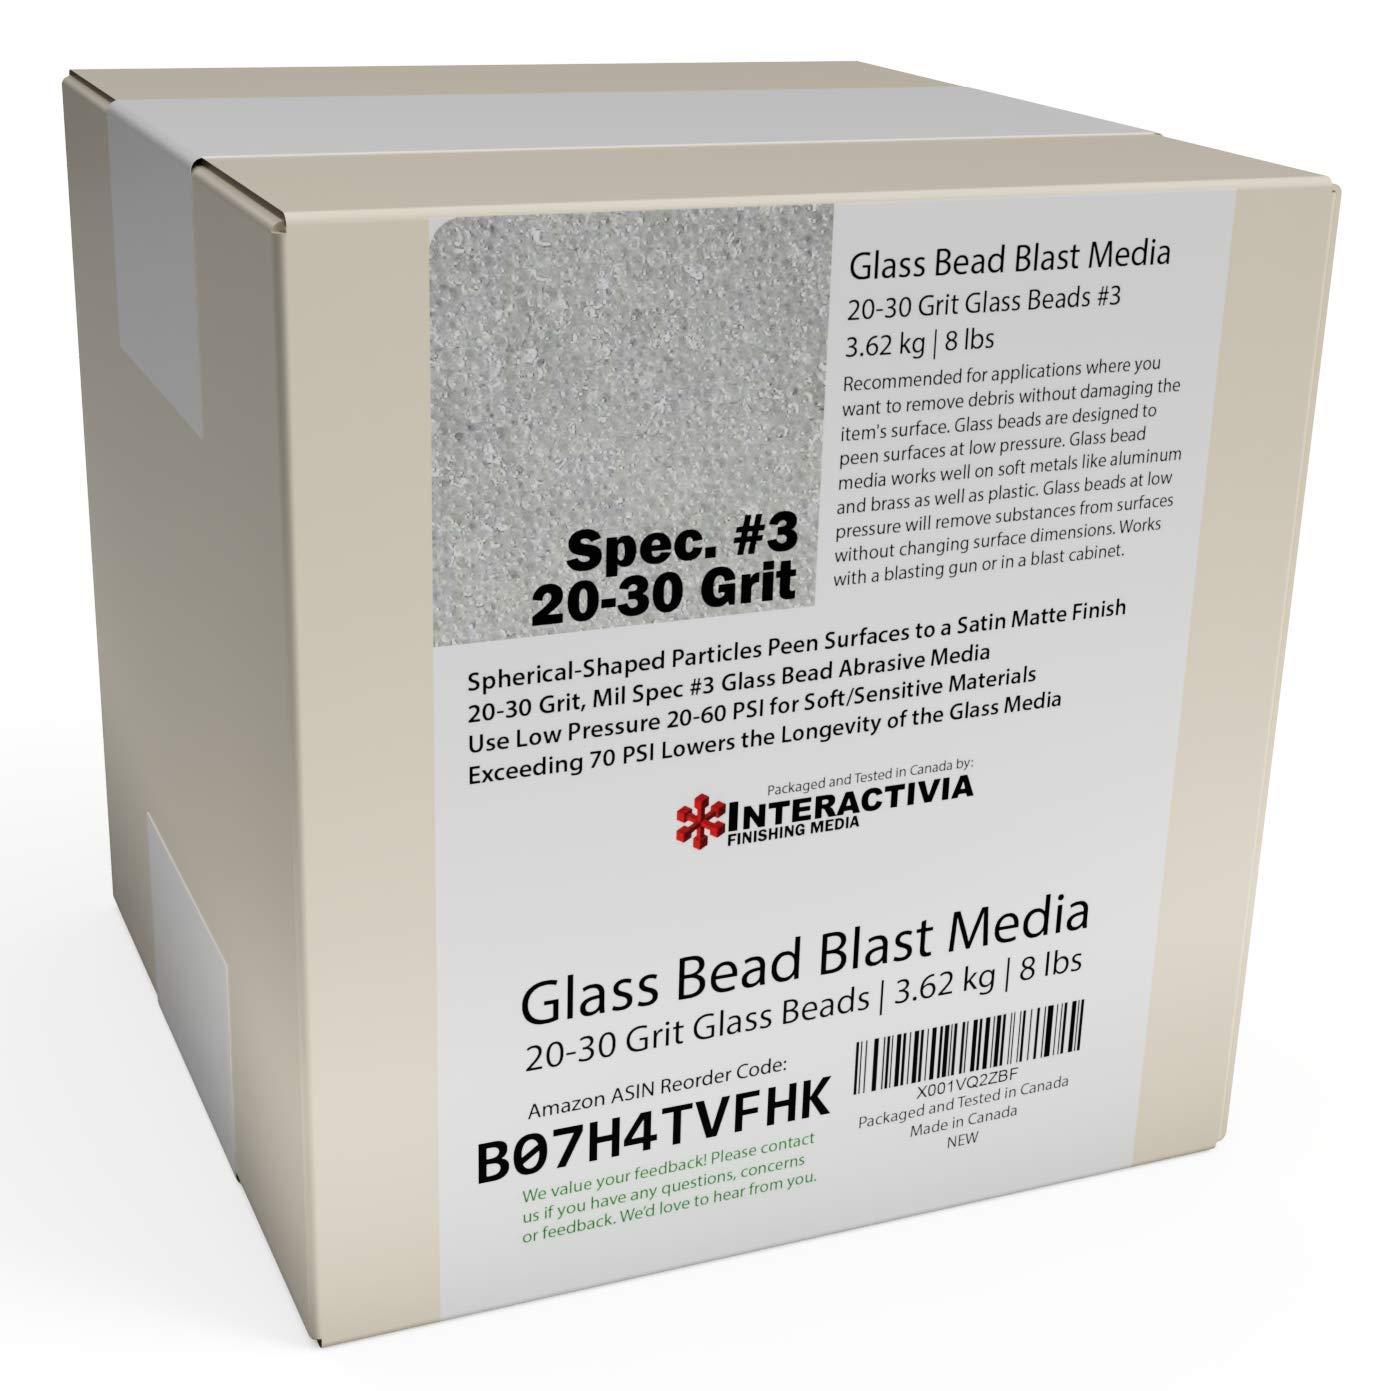 8 lb or 3.6 kg #3 Glass Bead Blasting Abrasive Media Course 20-30 Grit Or Commercial Spec No 3 for Blast Cabinets Or Sand Blasting Guns